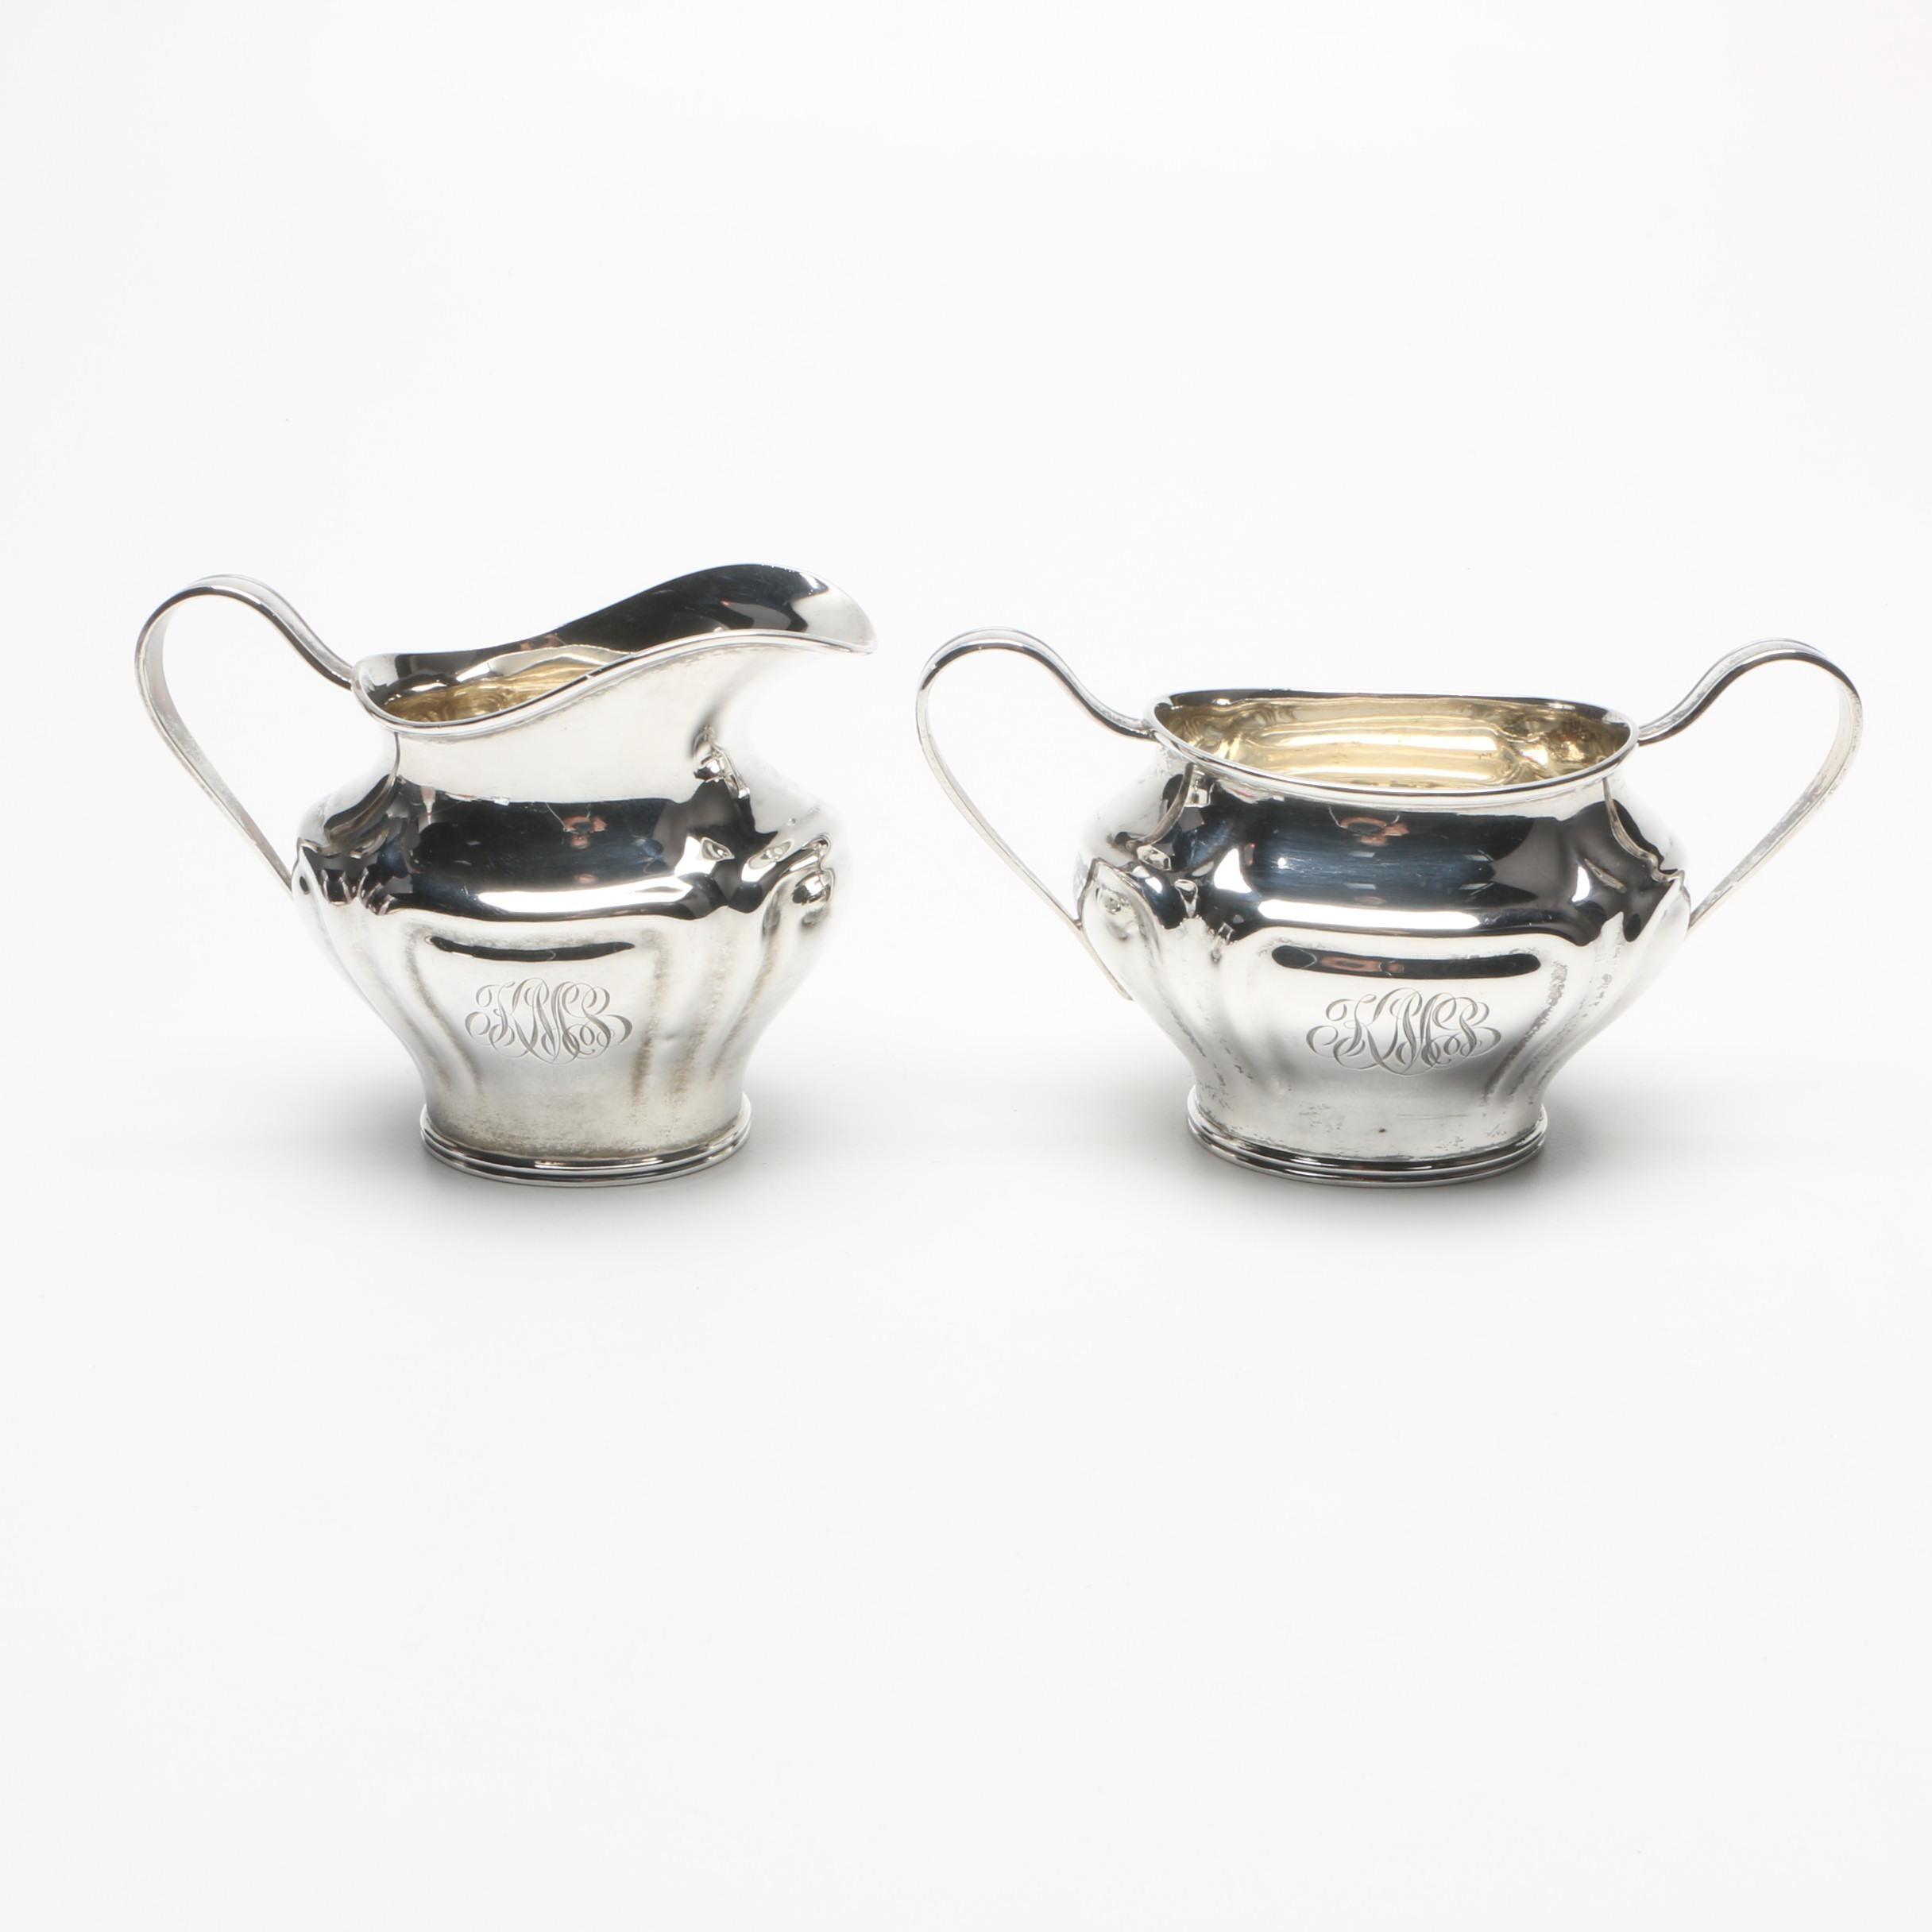 Newburyport Silver Co Sterling Silver Creamer and Sugar Bowl